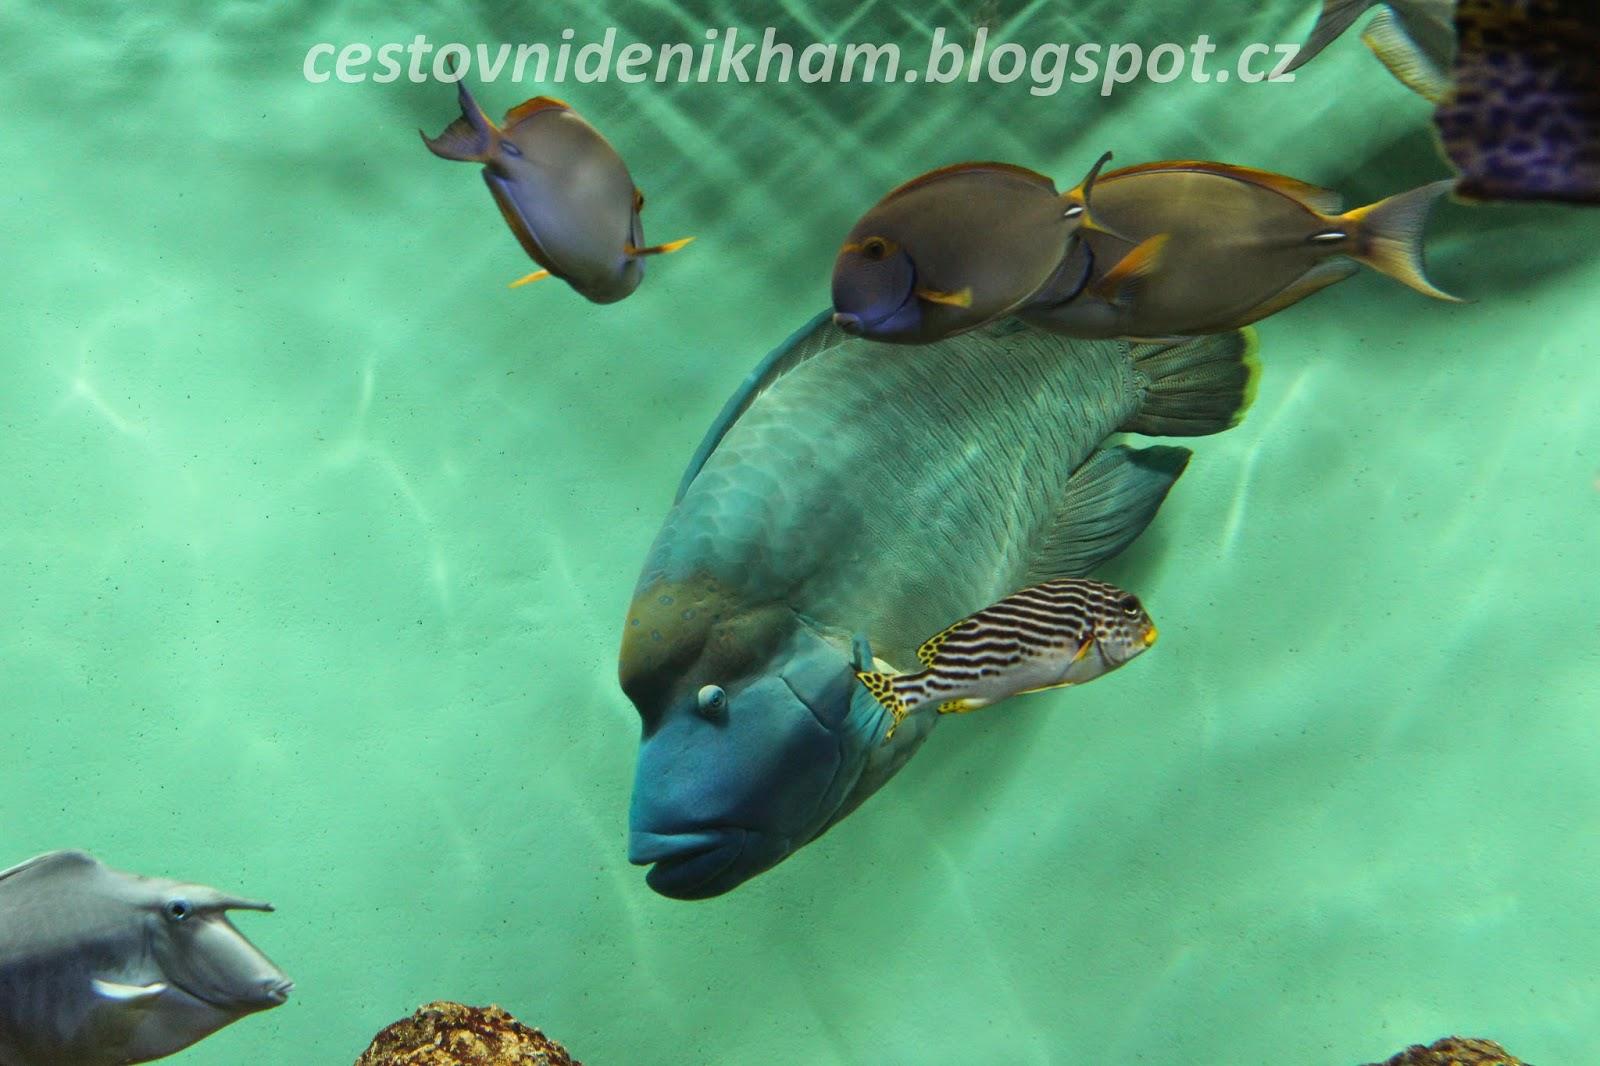 okyo Sea Life Park